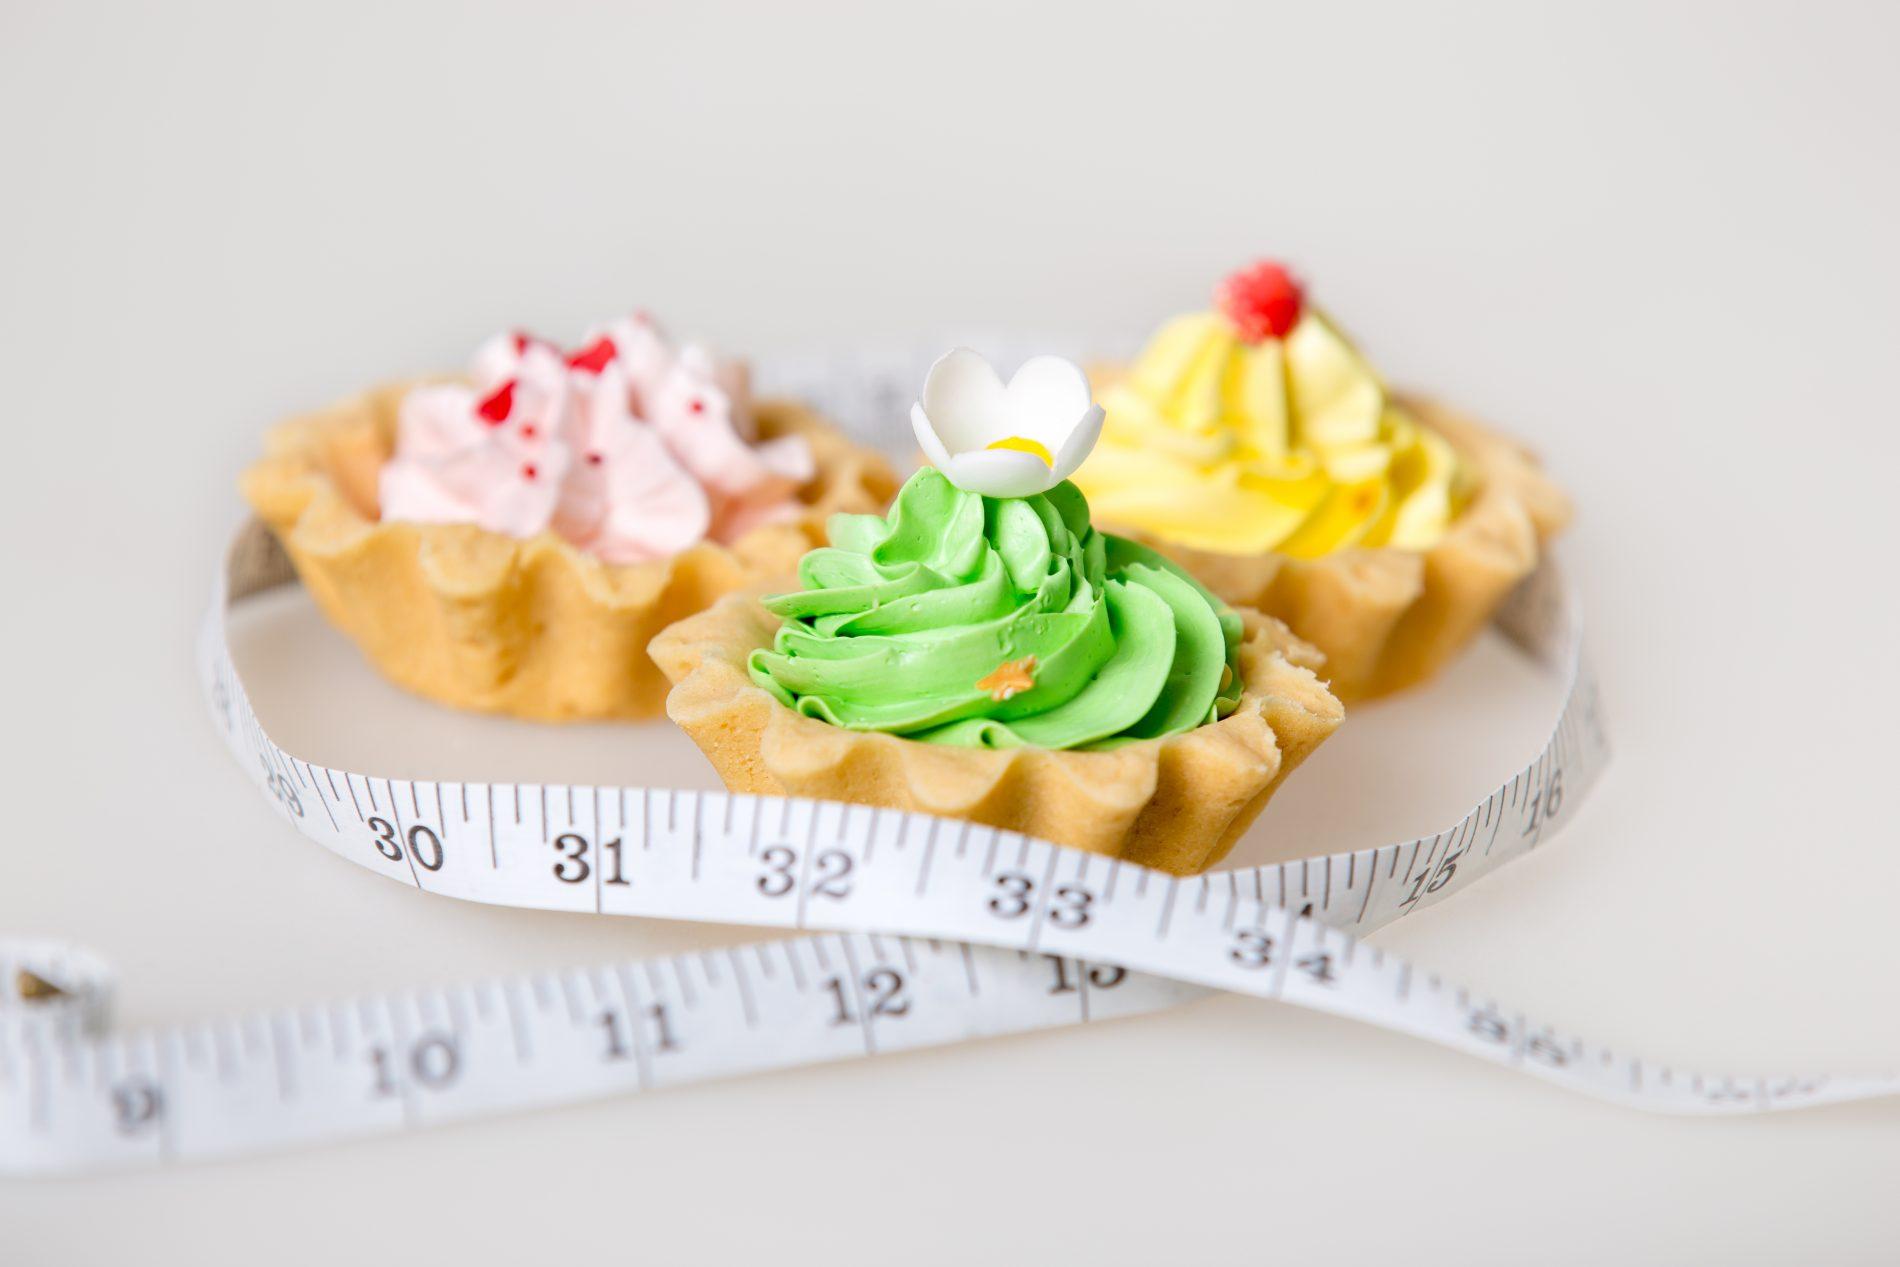 Diabet-nutritie-urodiamed-craiova